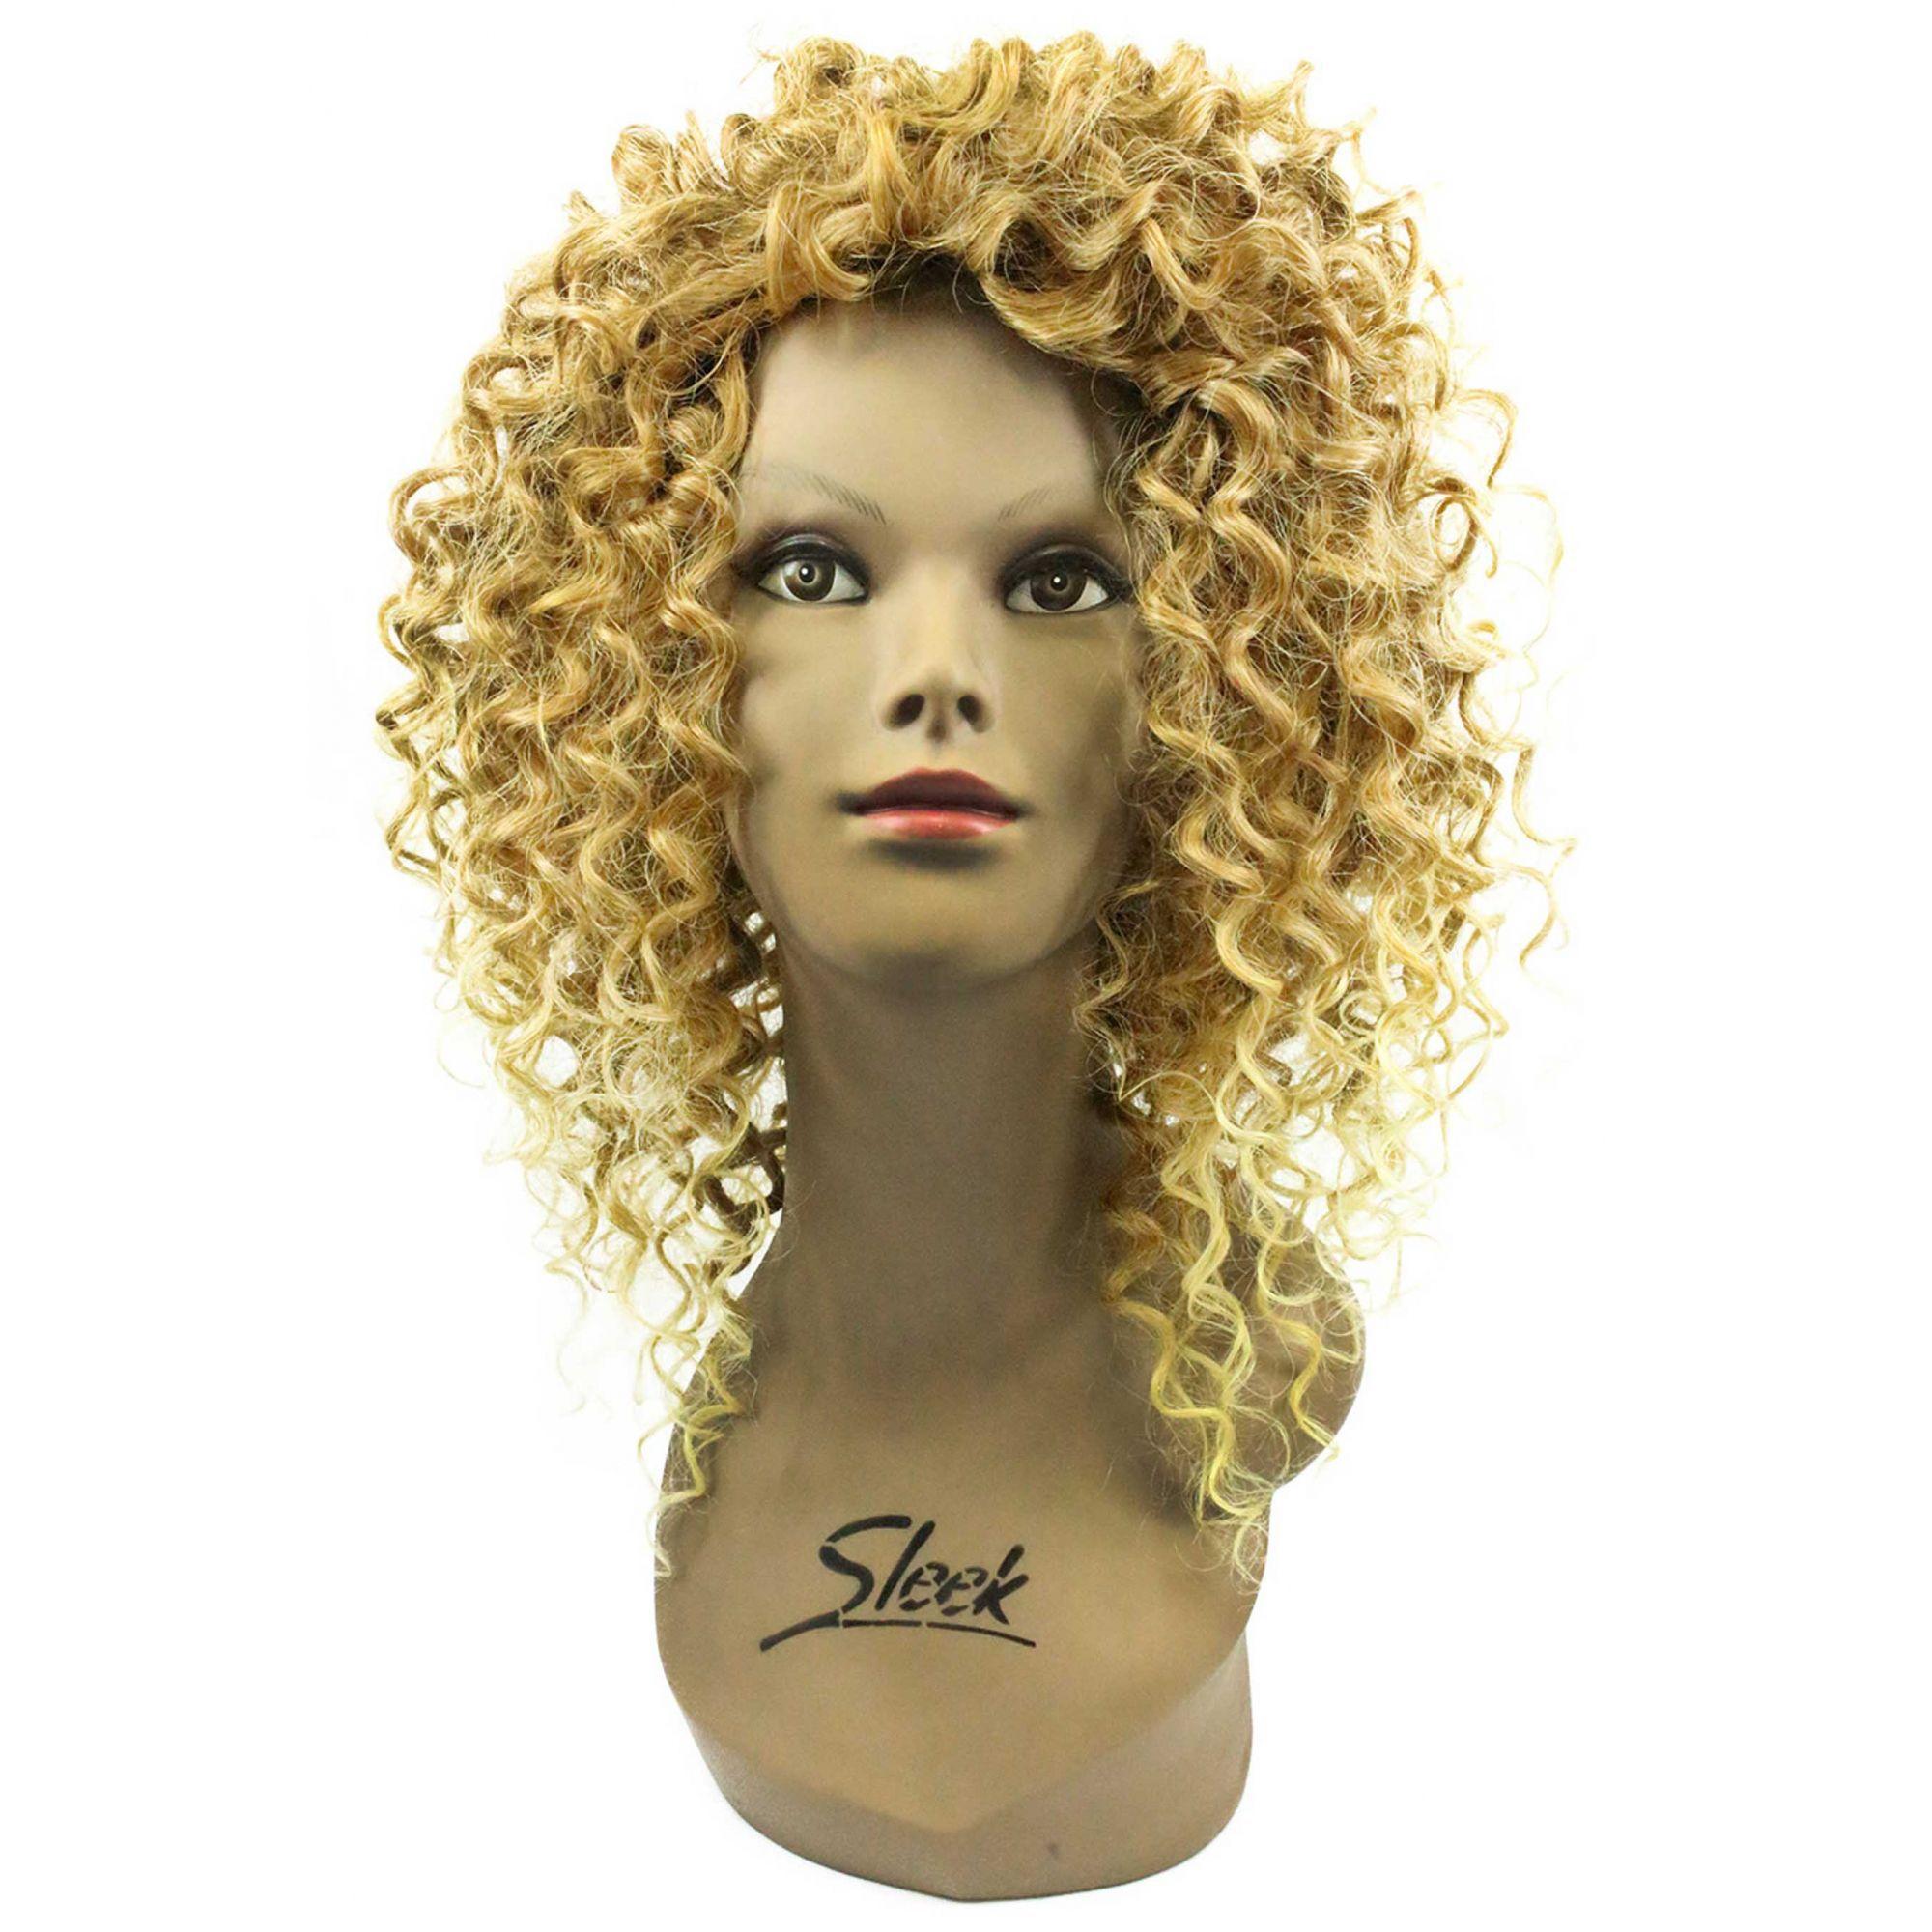 Cabelo Orgânico - Sleek Fashion Idol True Me - Lia